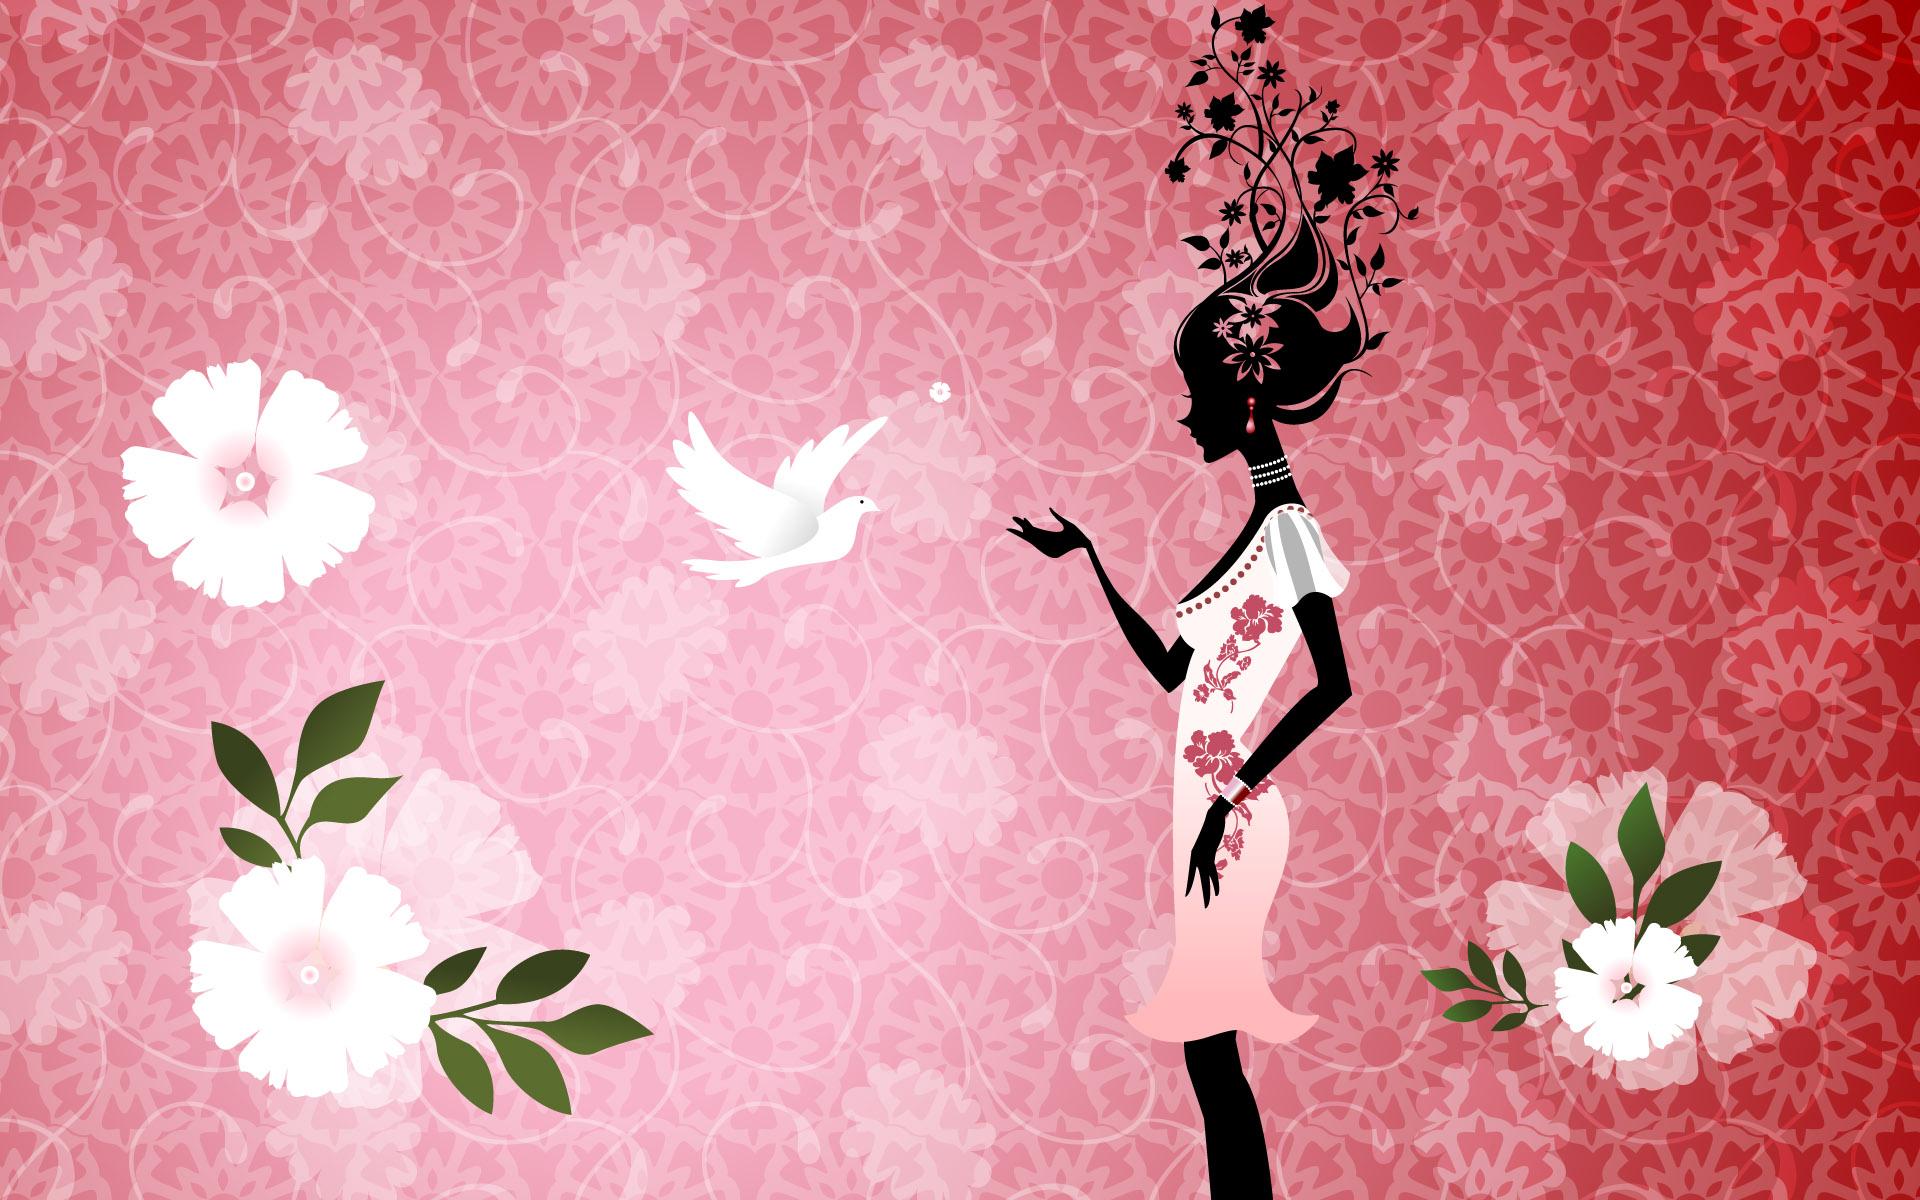 Cute Anime Love Couple Wallpaper Girly Wallpapers Hd Free Download Pixelstalk Net